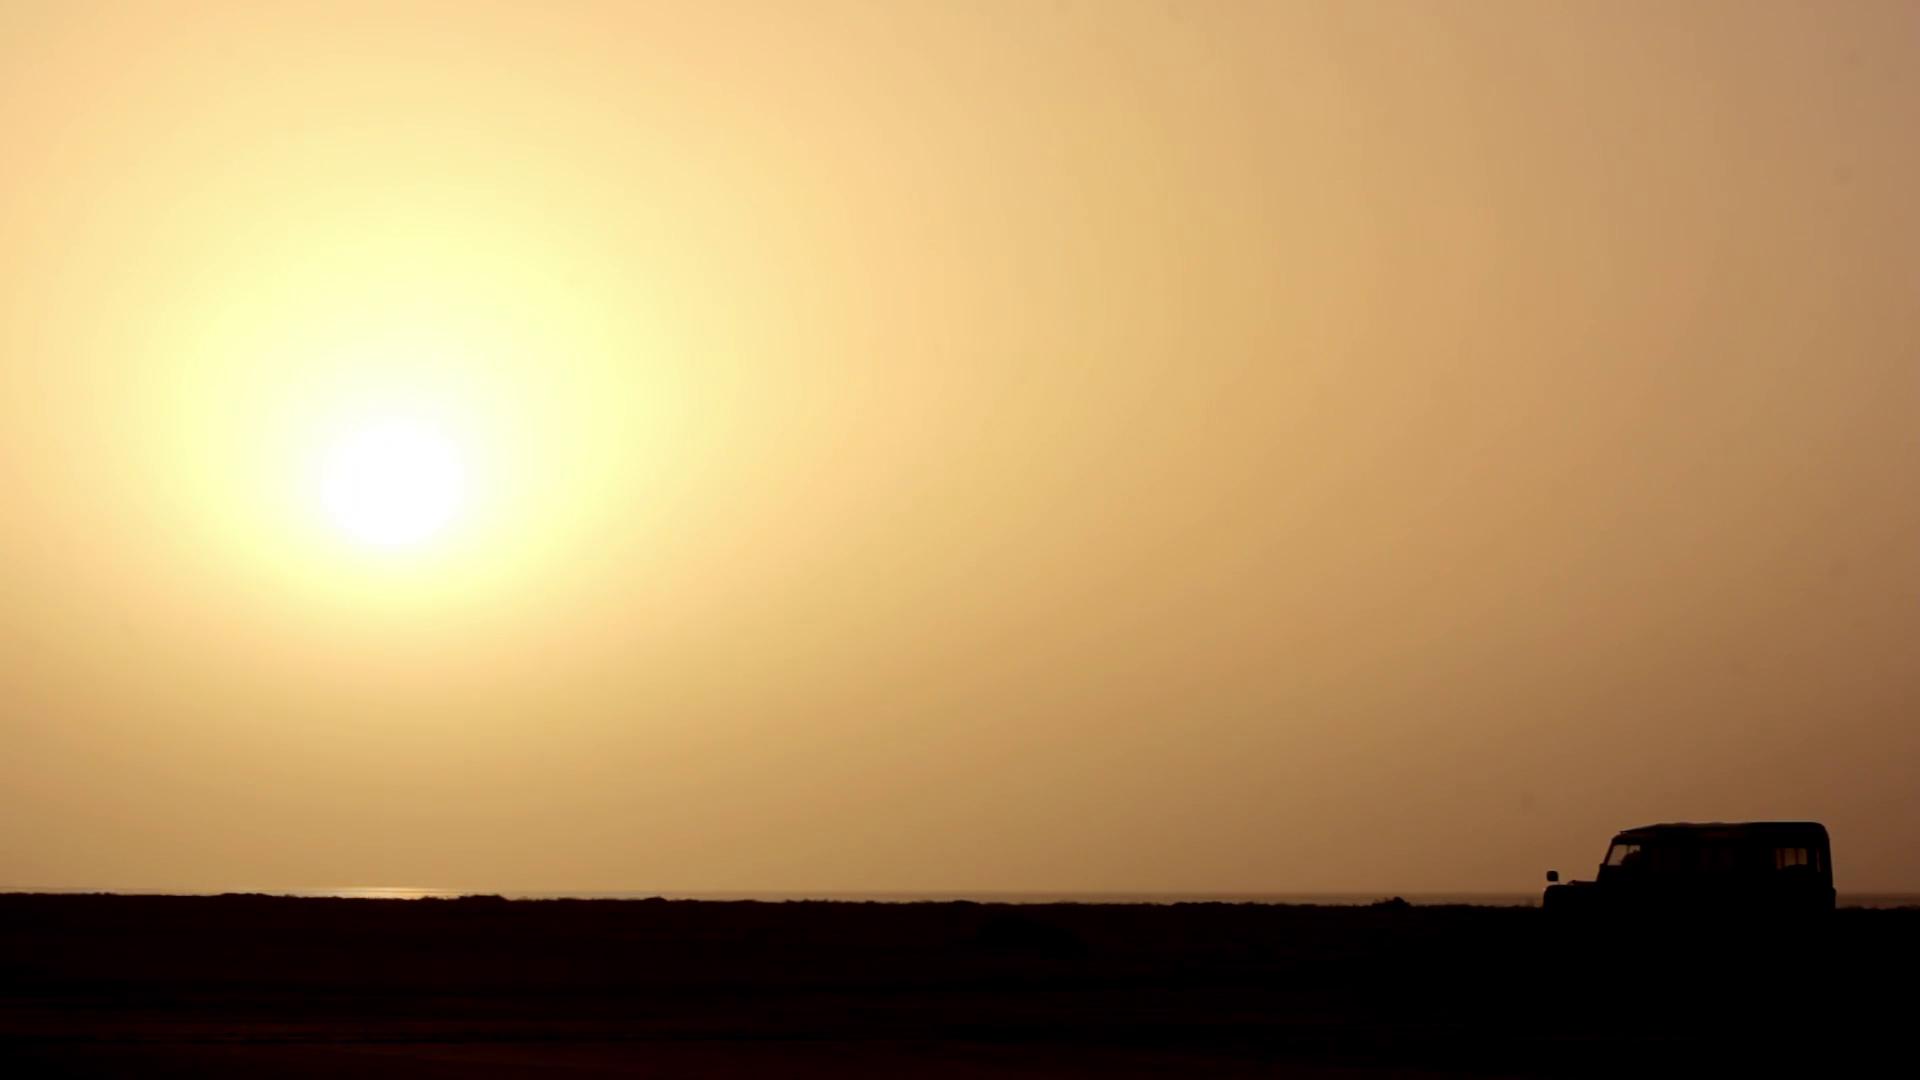 desierto sublime mauritania pablocaminante - Mauritania 2/5, de Nouadhibou a Nouakchott